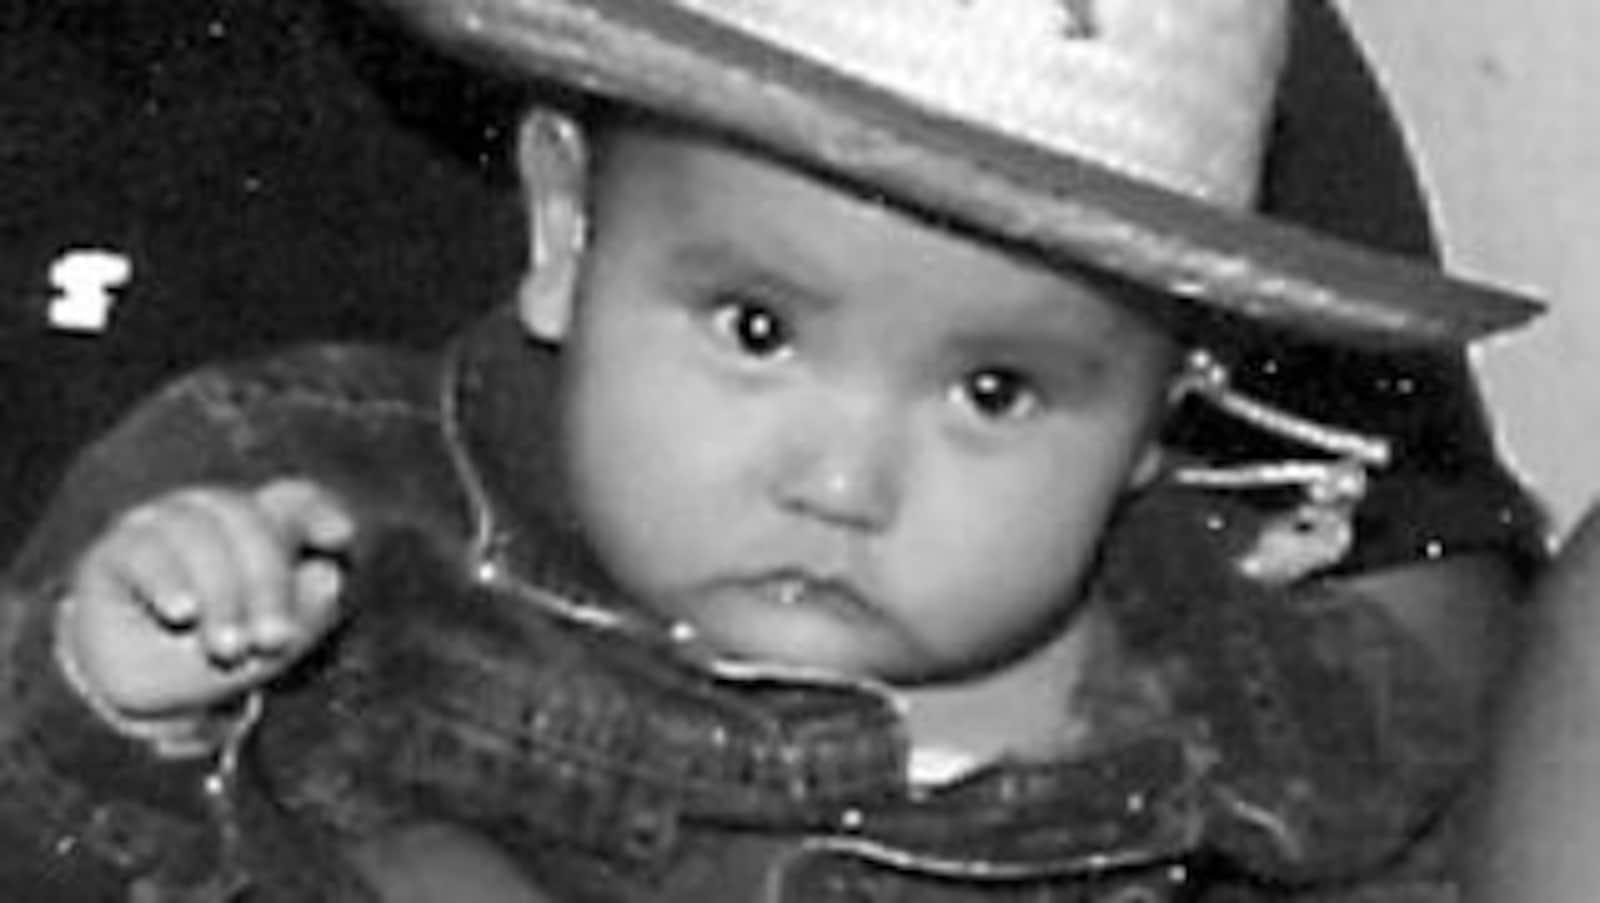 La petite Kierra Elektra Star Williams